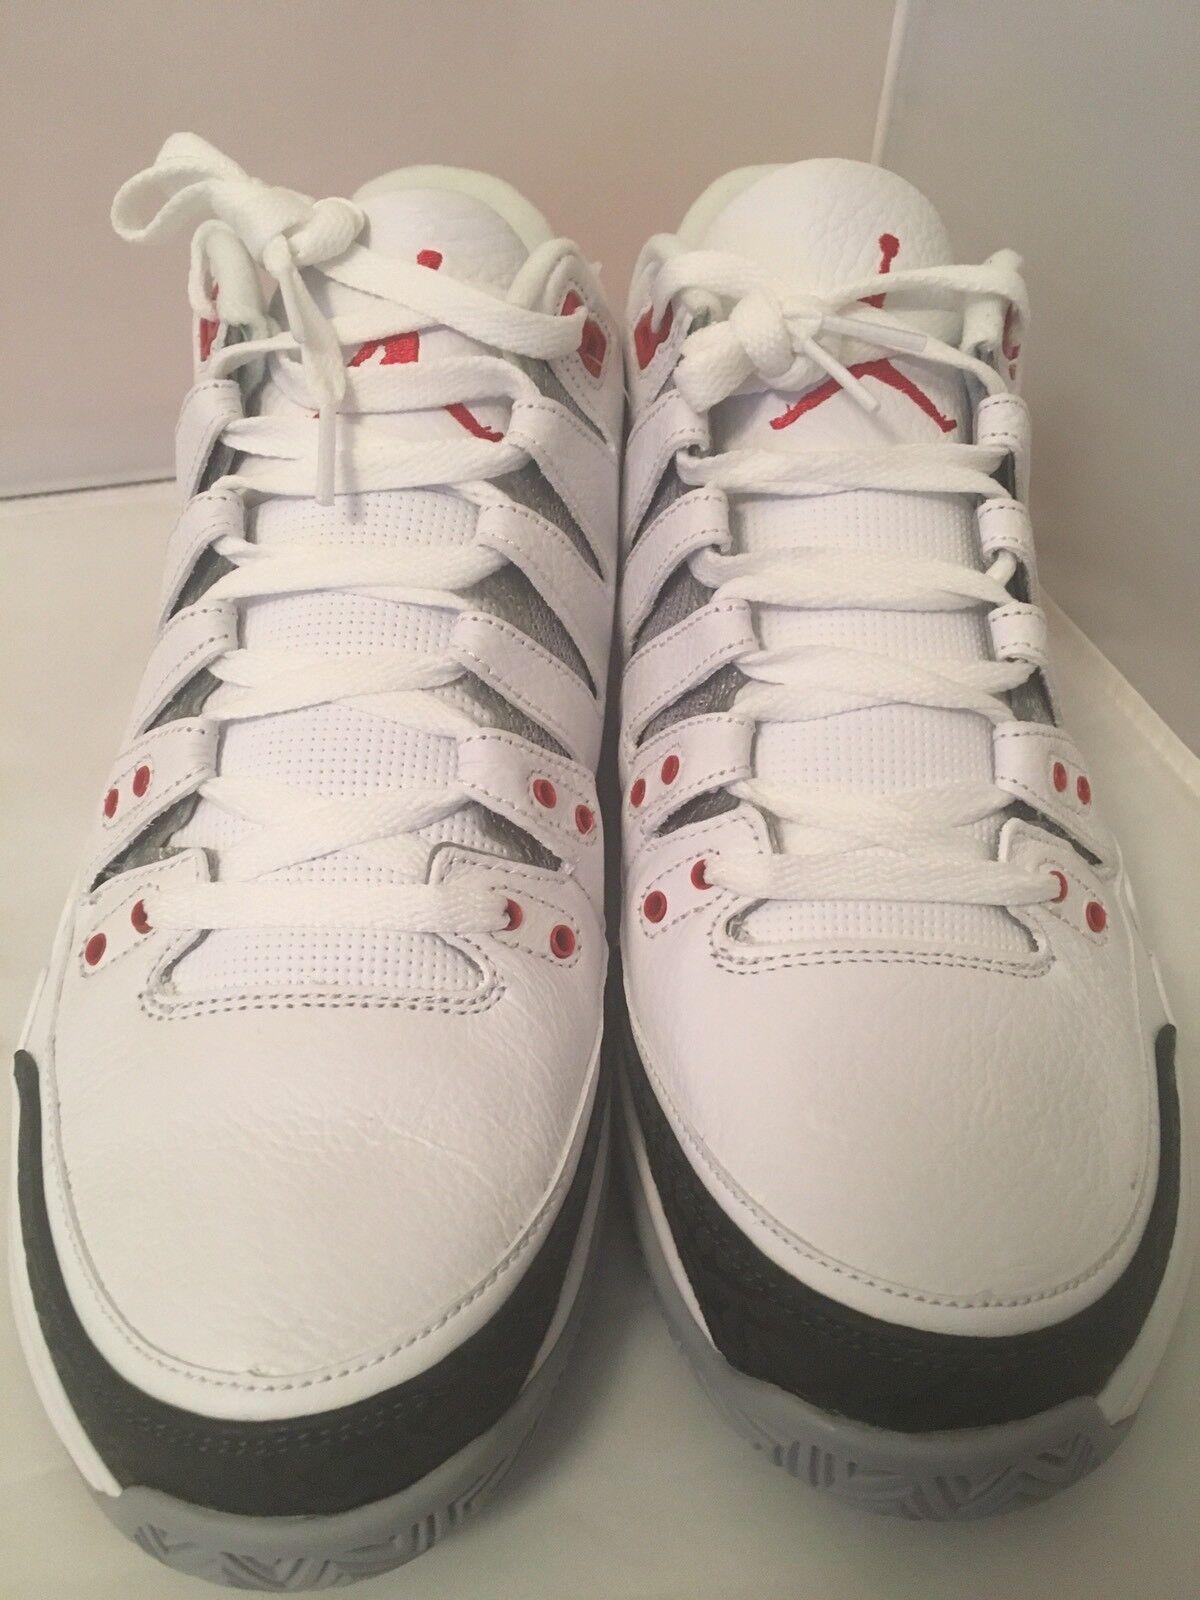 8e4e07972e6e ... Nike Nike Nike Zoom Vapor x AJ3 Roger Federer RF Fire Red 709998 106  c44593 ...